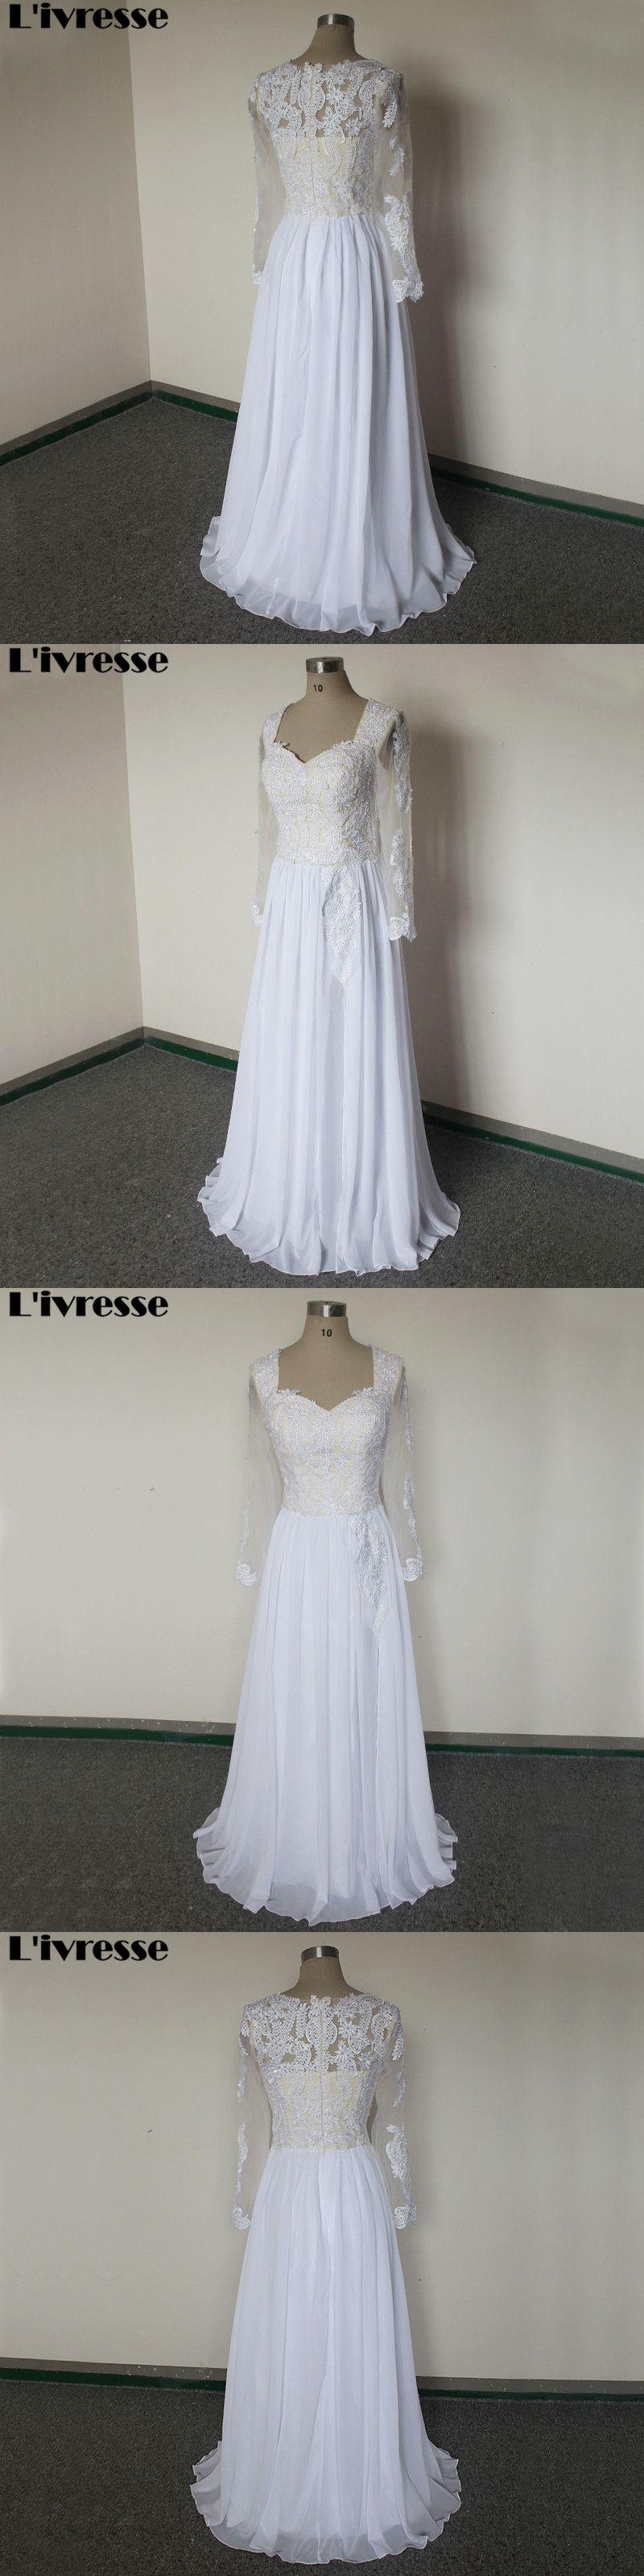 Long sleeve chiffon wedding dress  Cheap Chiffon Wedding Dresses With Long Sleeve Sweetheart Appliques